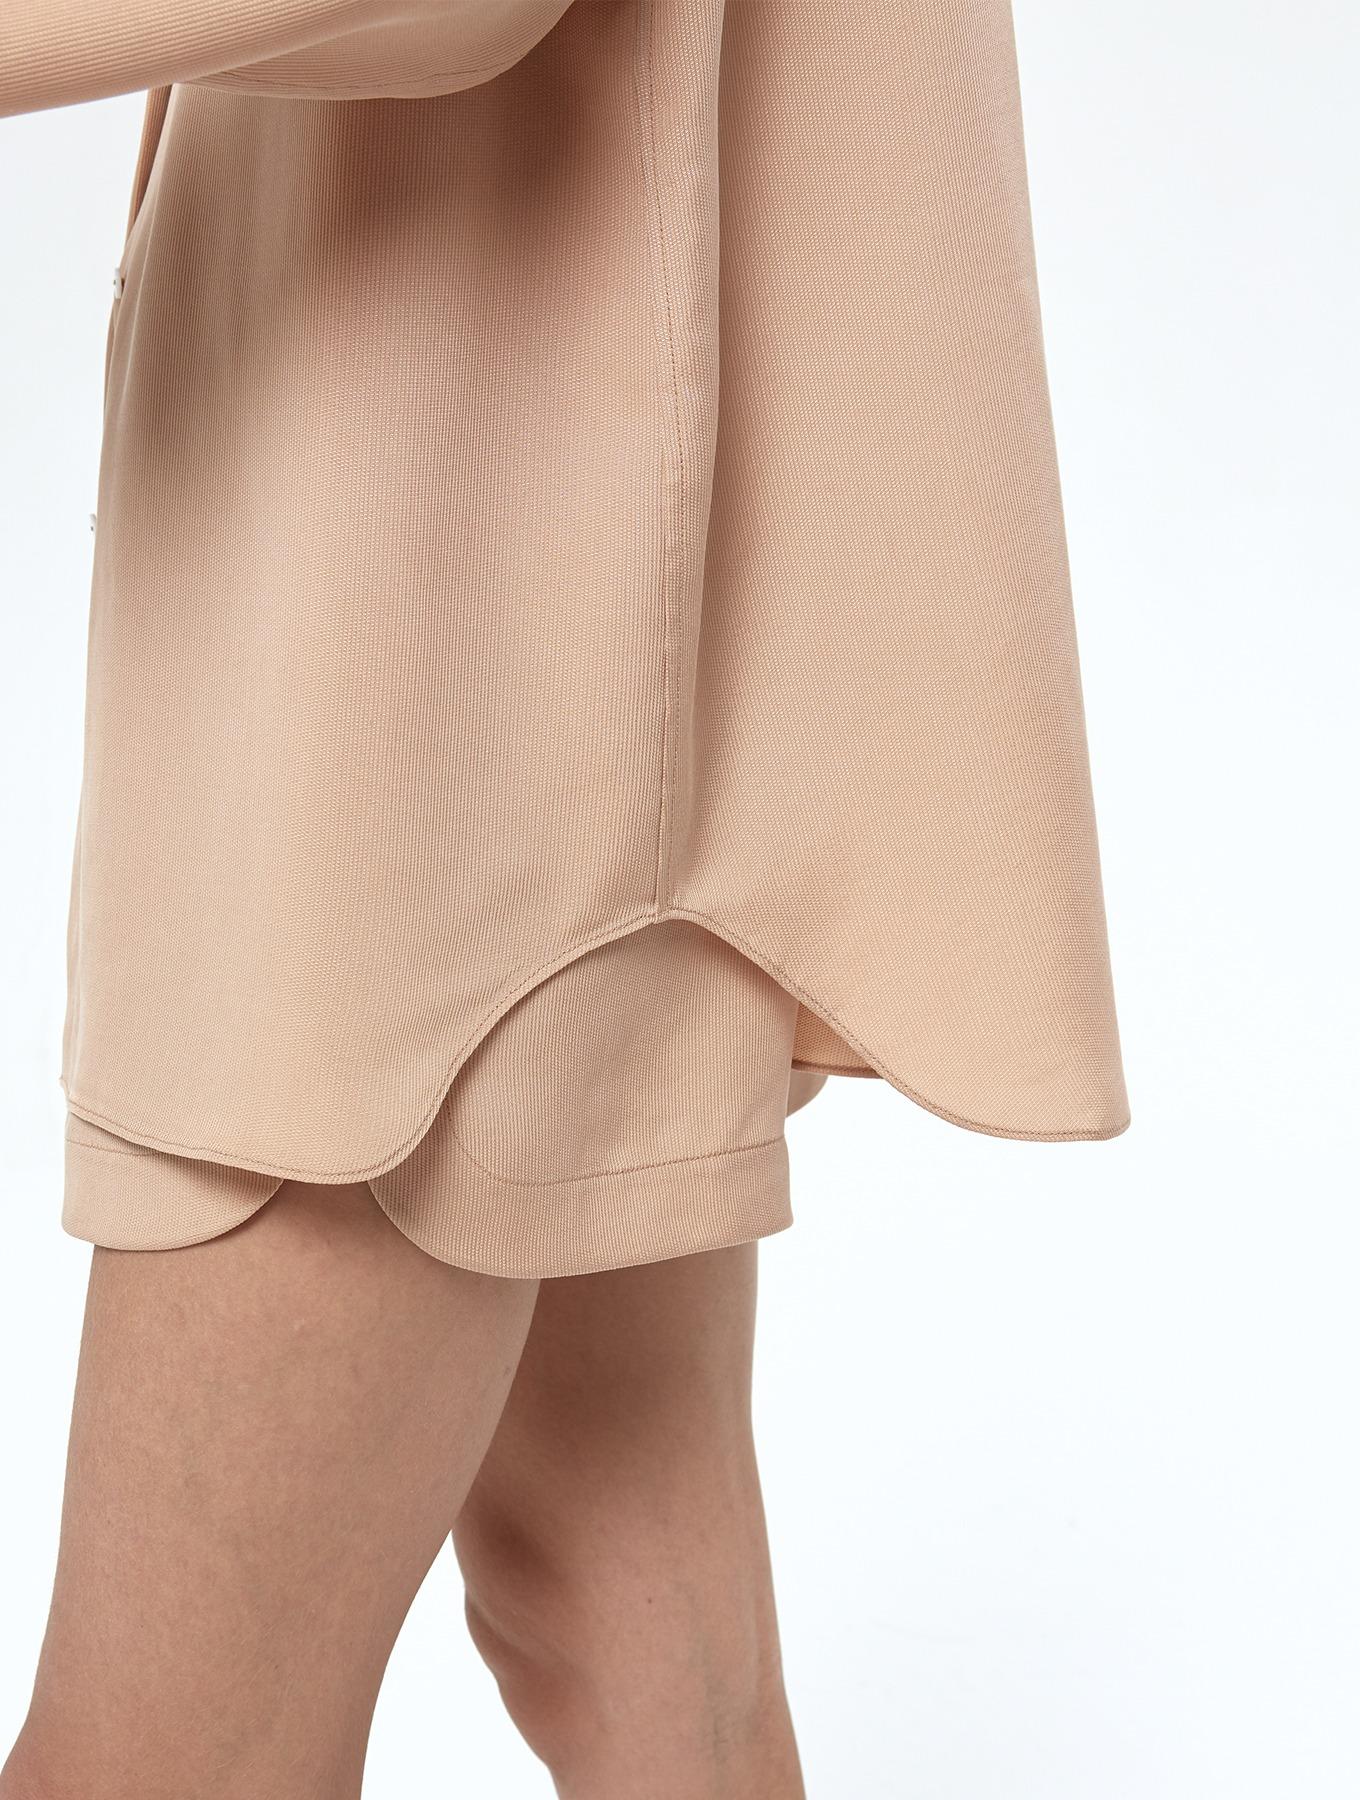 Cool silk leisure short_002